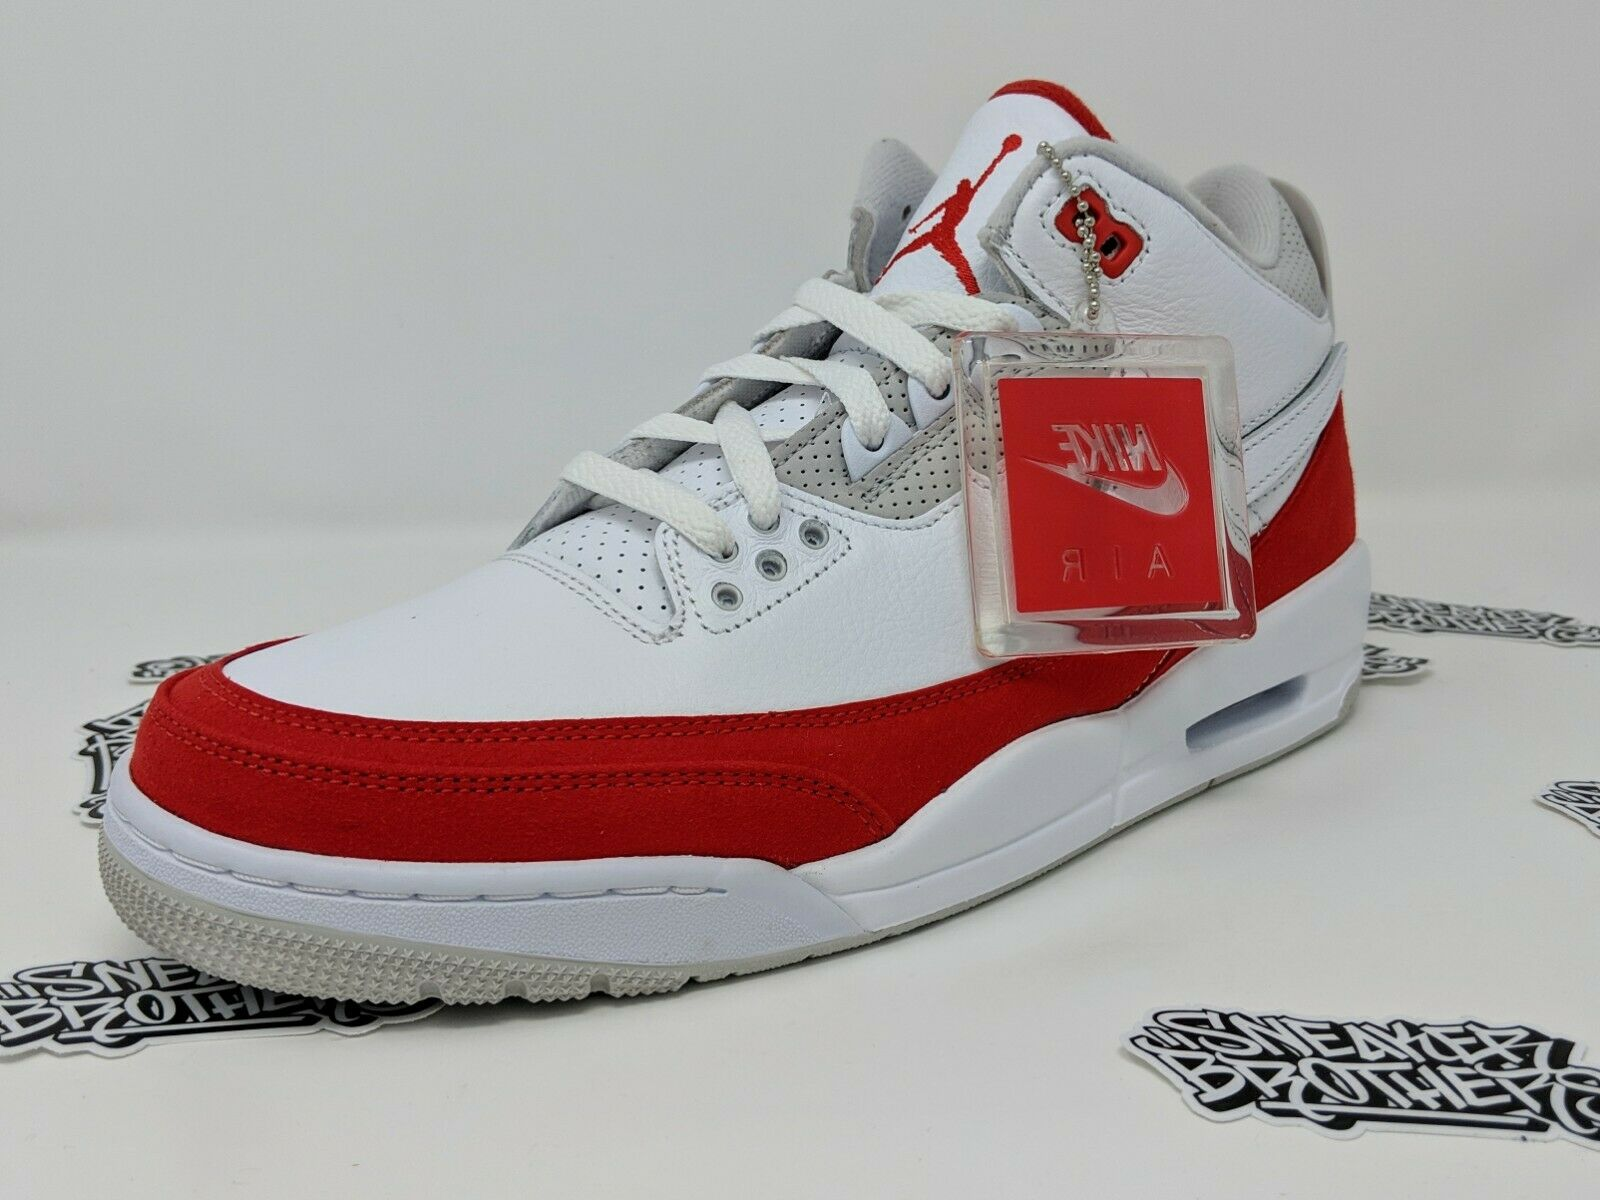 Nike Air Jordan Retro III 3 Tinker Hatfield TH SP Air Max 1 White Red CJ0939-100